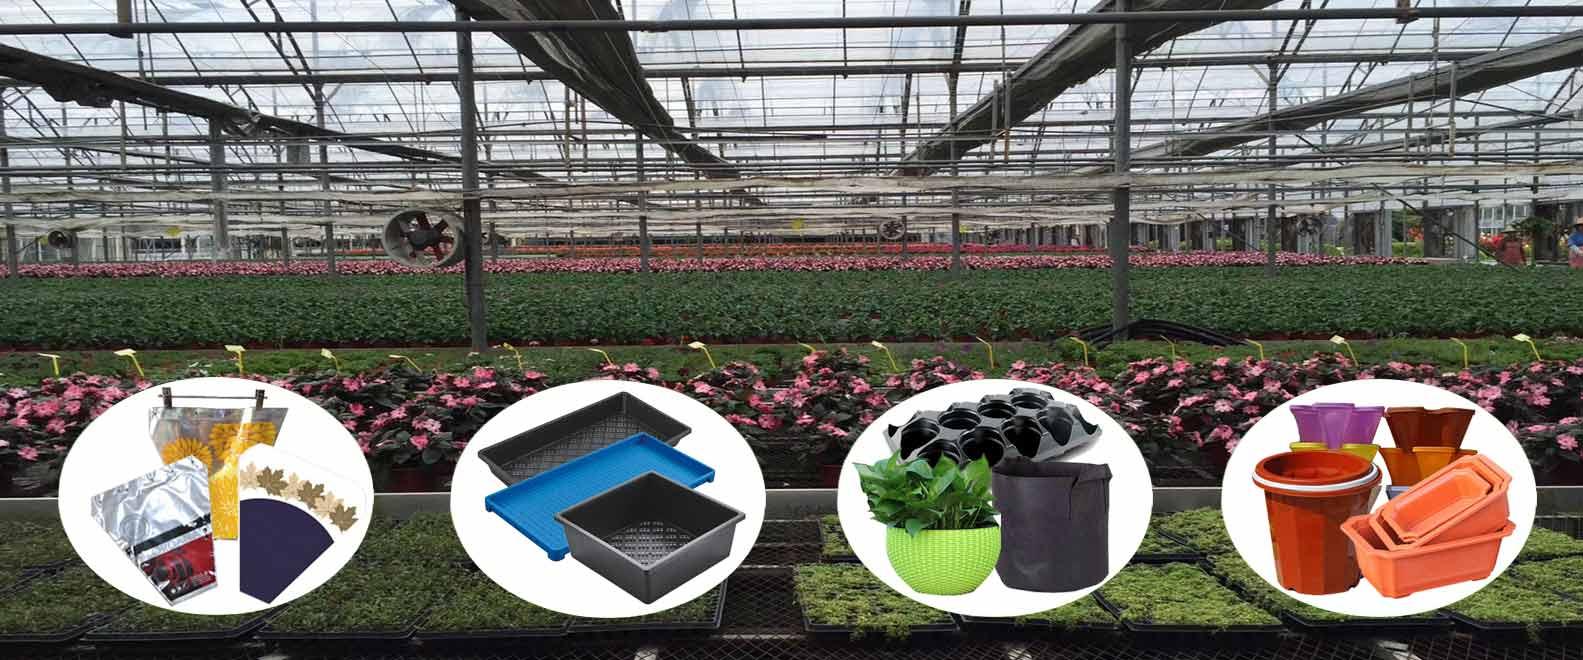 propagation tray